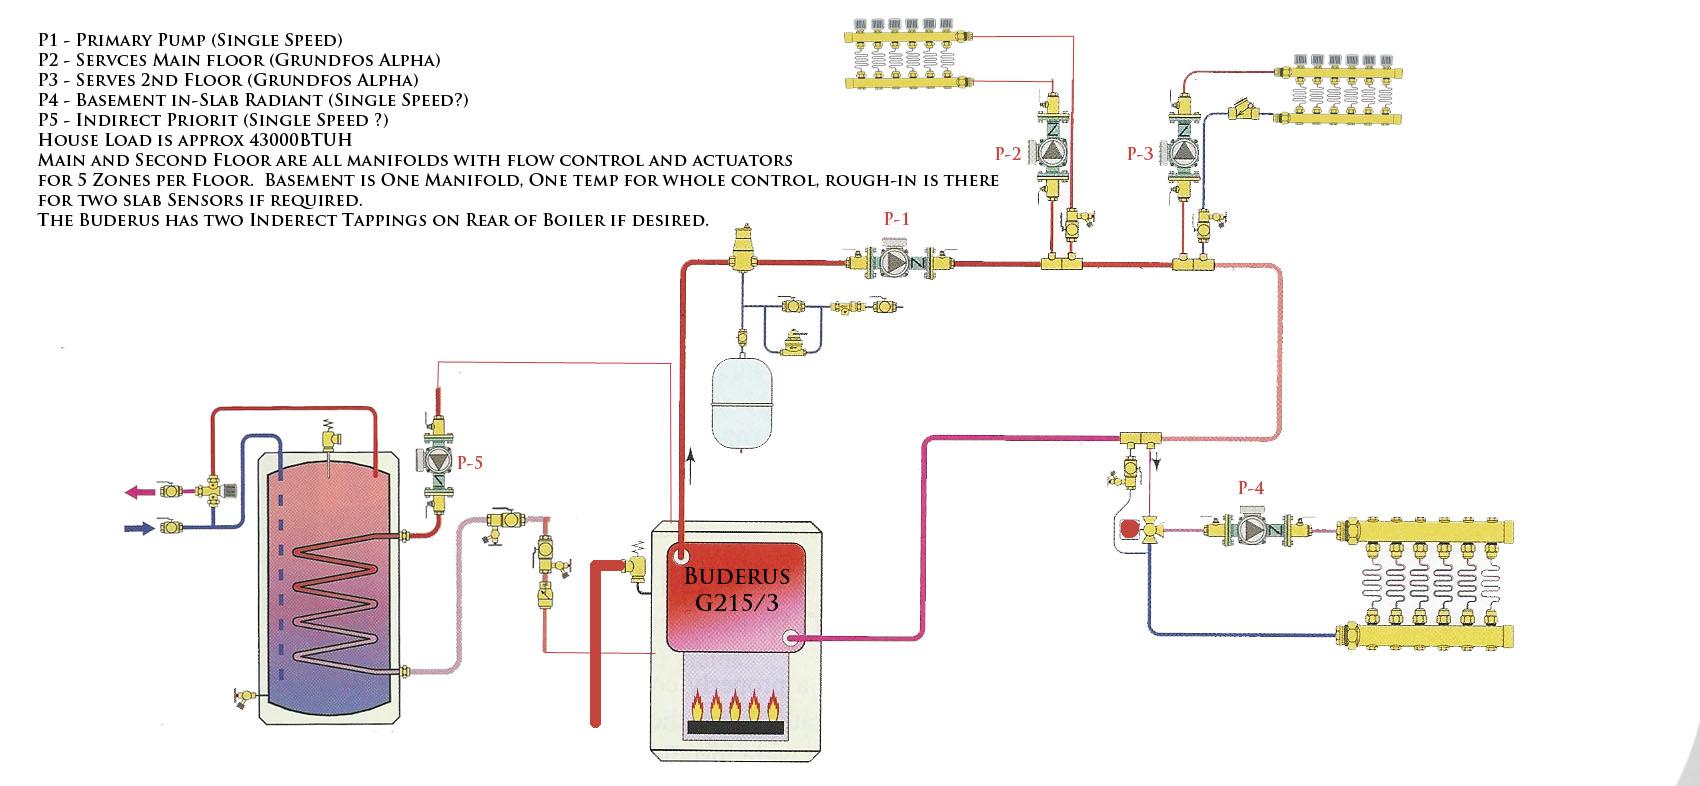 Boiler Room Setup (DHW/ODR/DD Dilemma) — Heating Help: The Wall